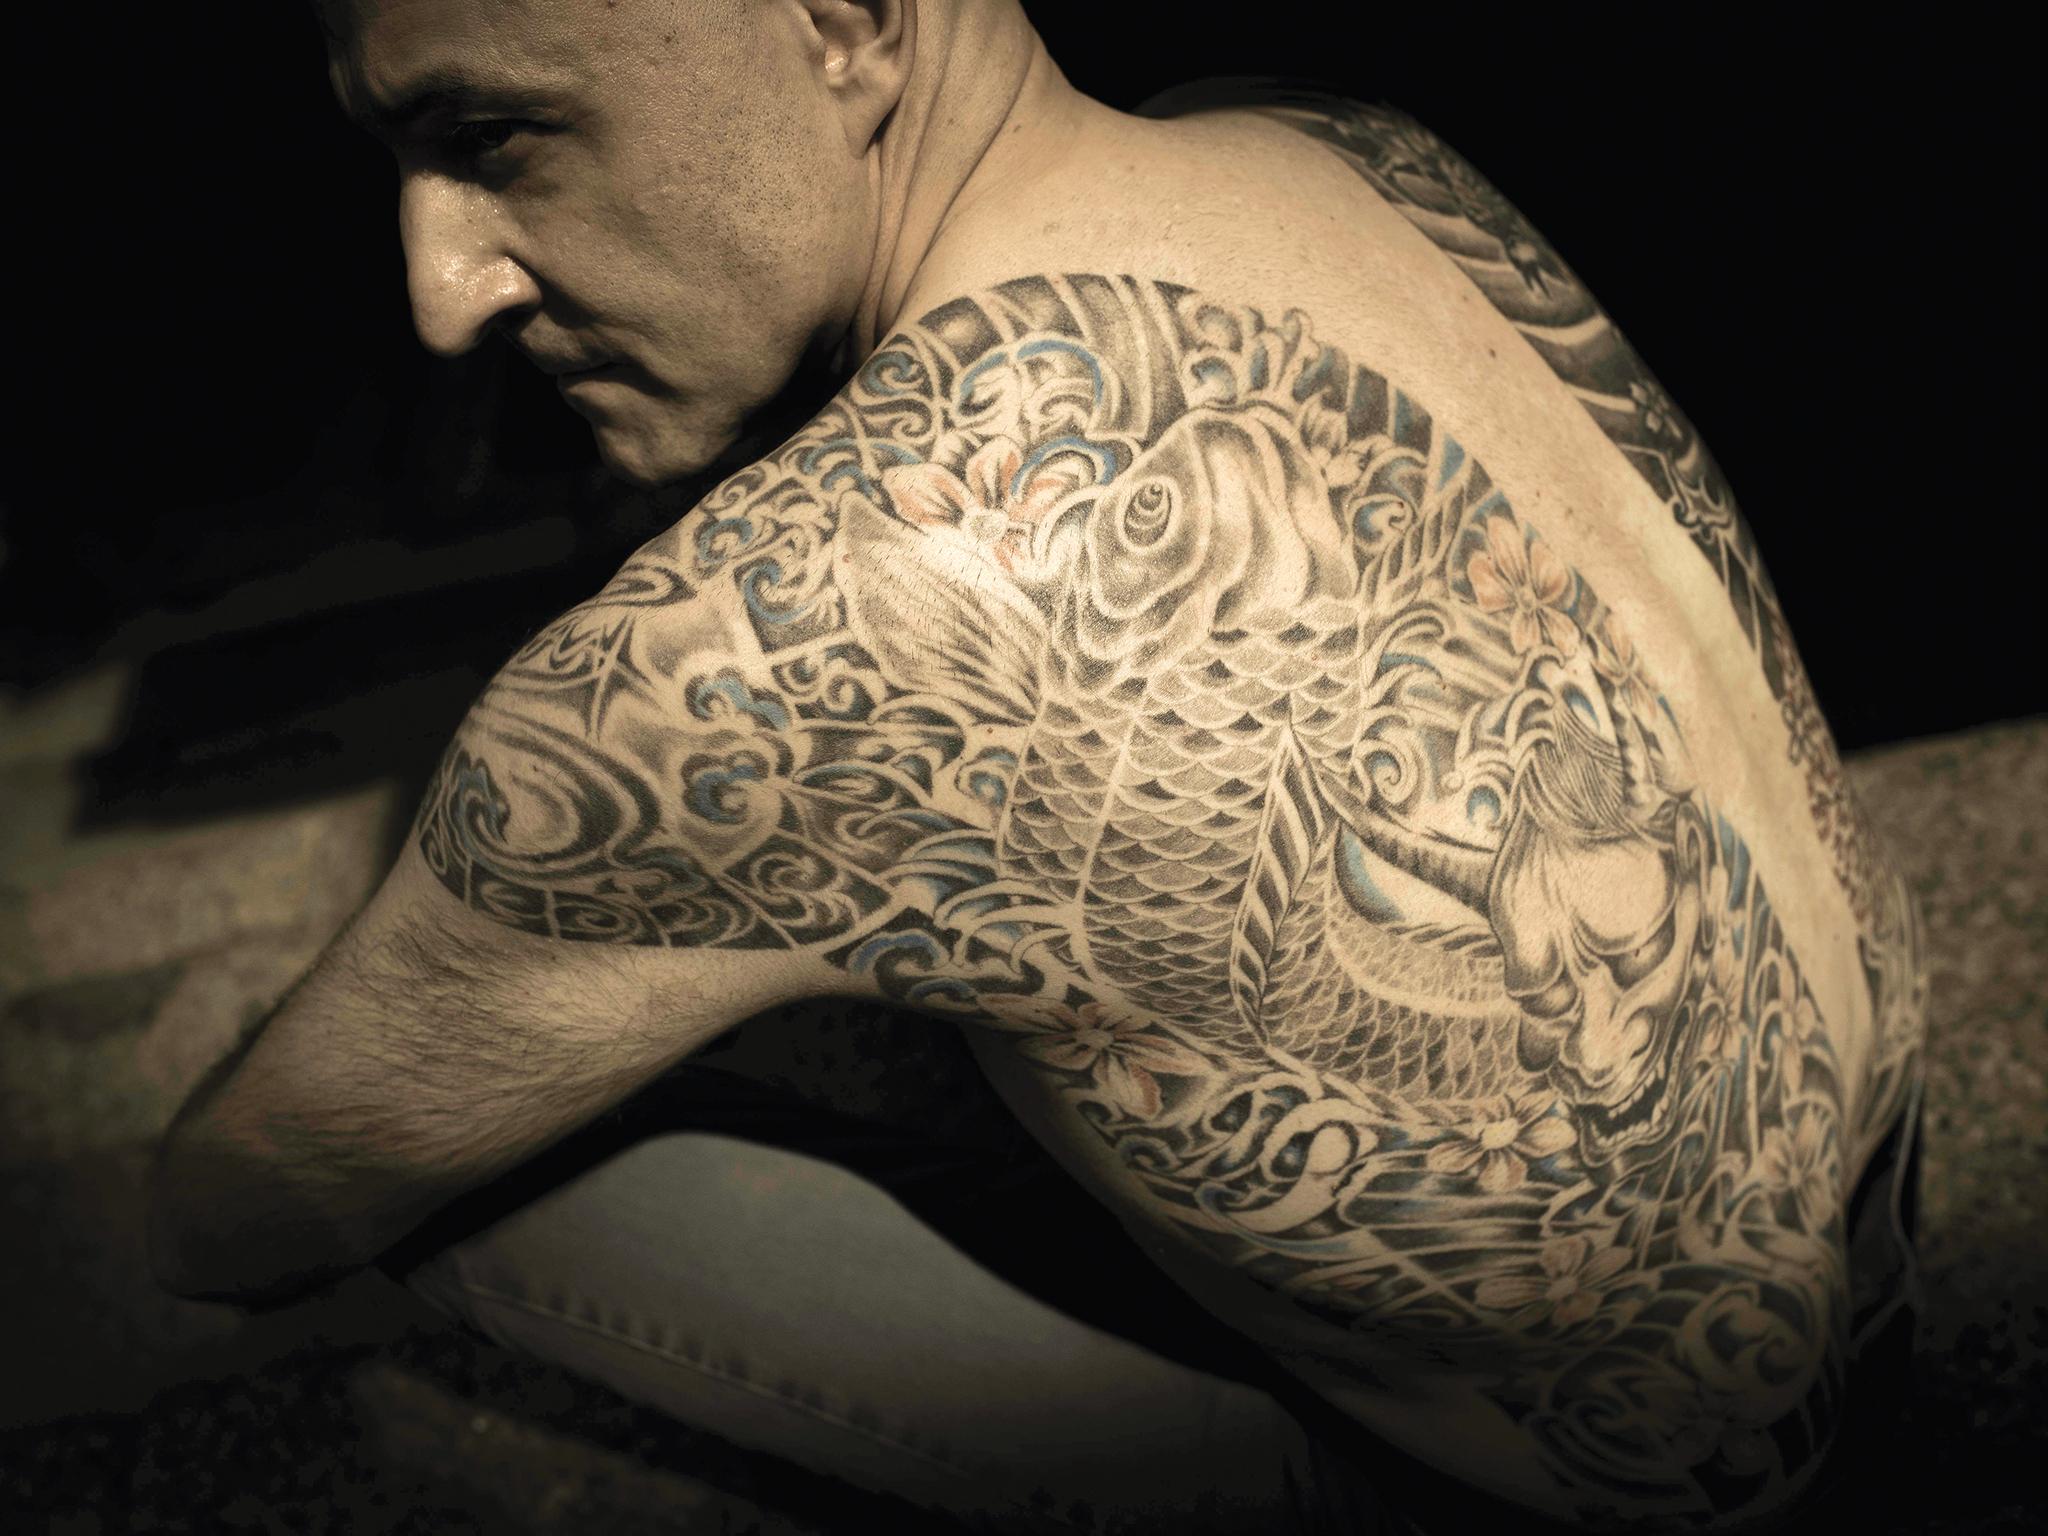 Sze C Tattoo